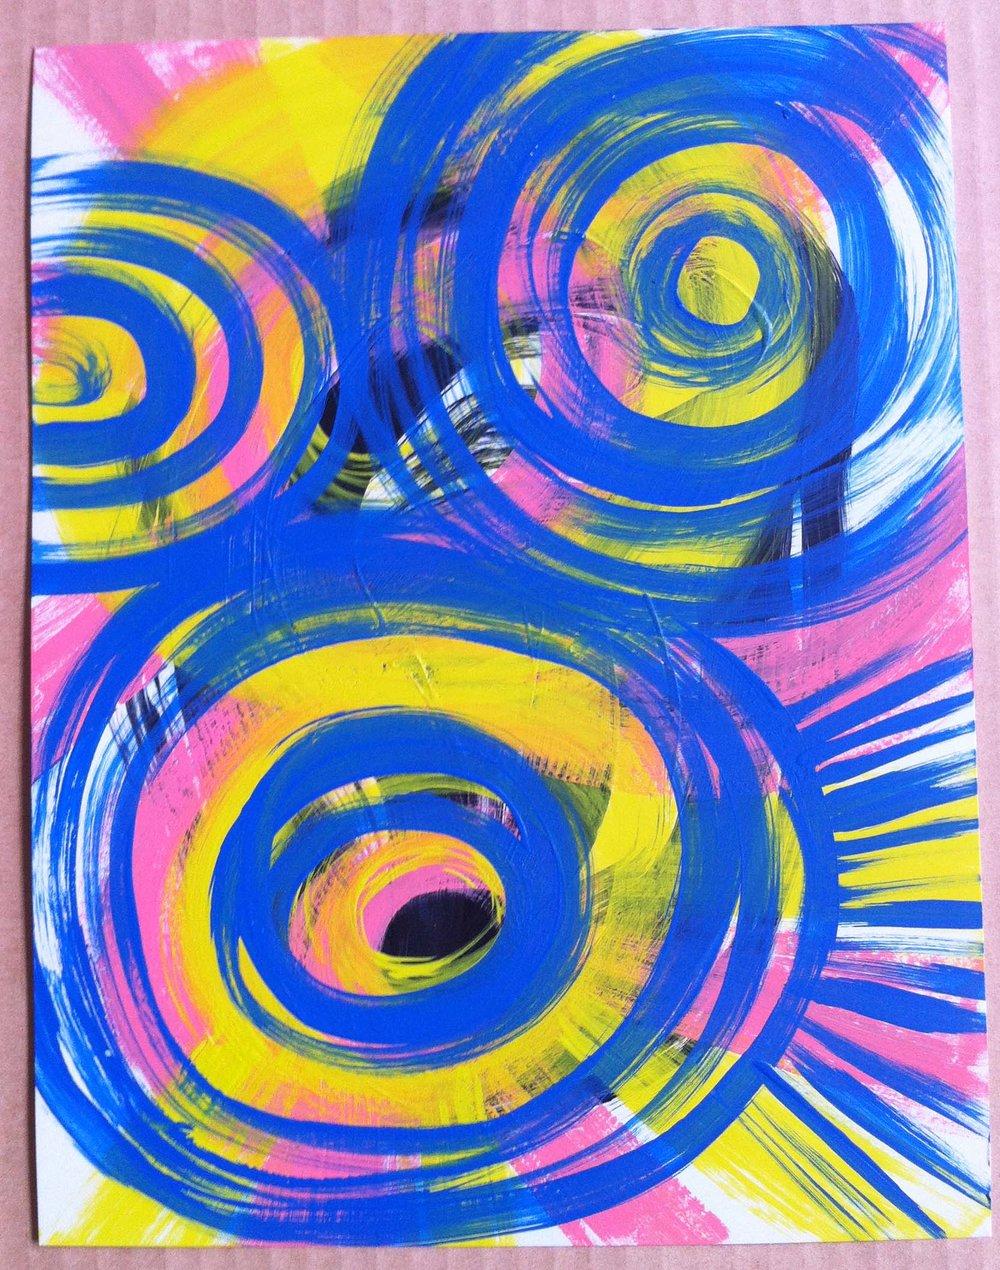 21. Acrylic on metallic paper: small 8.5x11